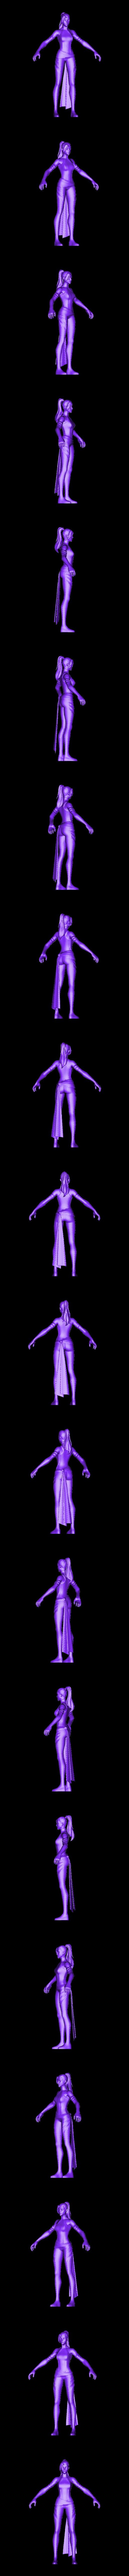 Psylocke Fortnite.stl Download free STL file Psylocke Fortnite • 3D printing object, detaildesigner